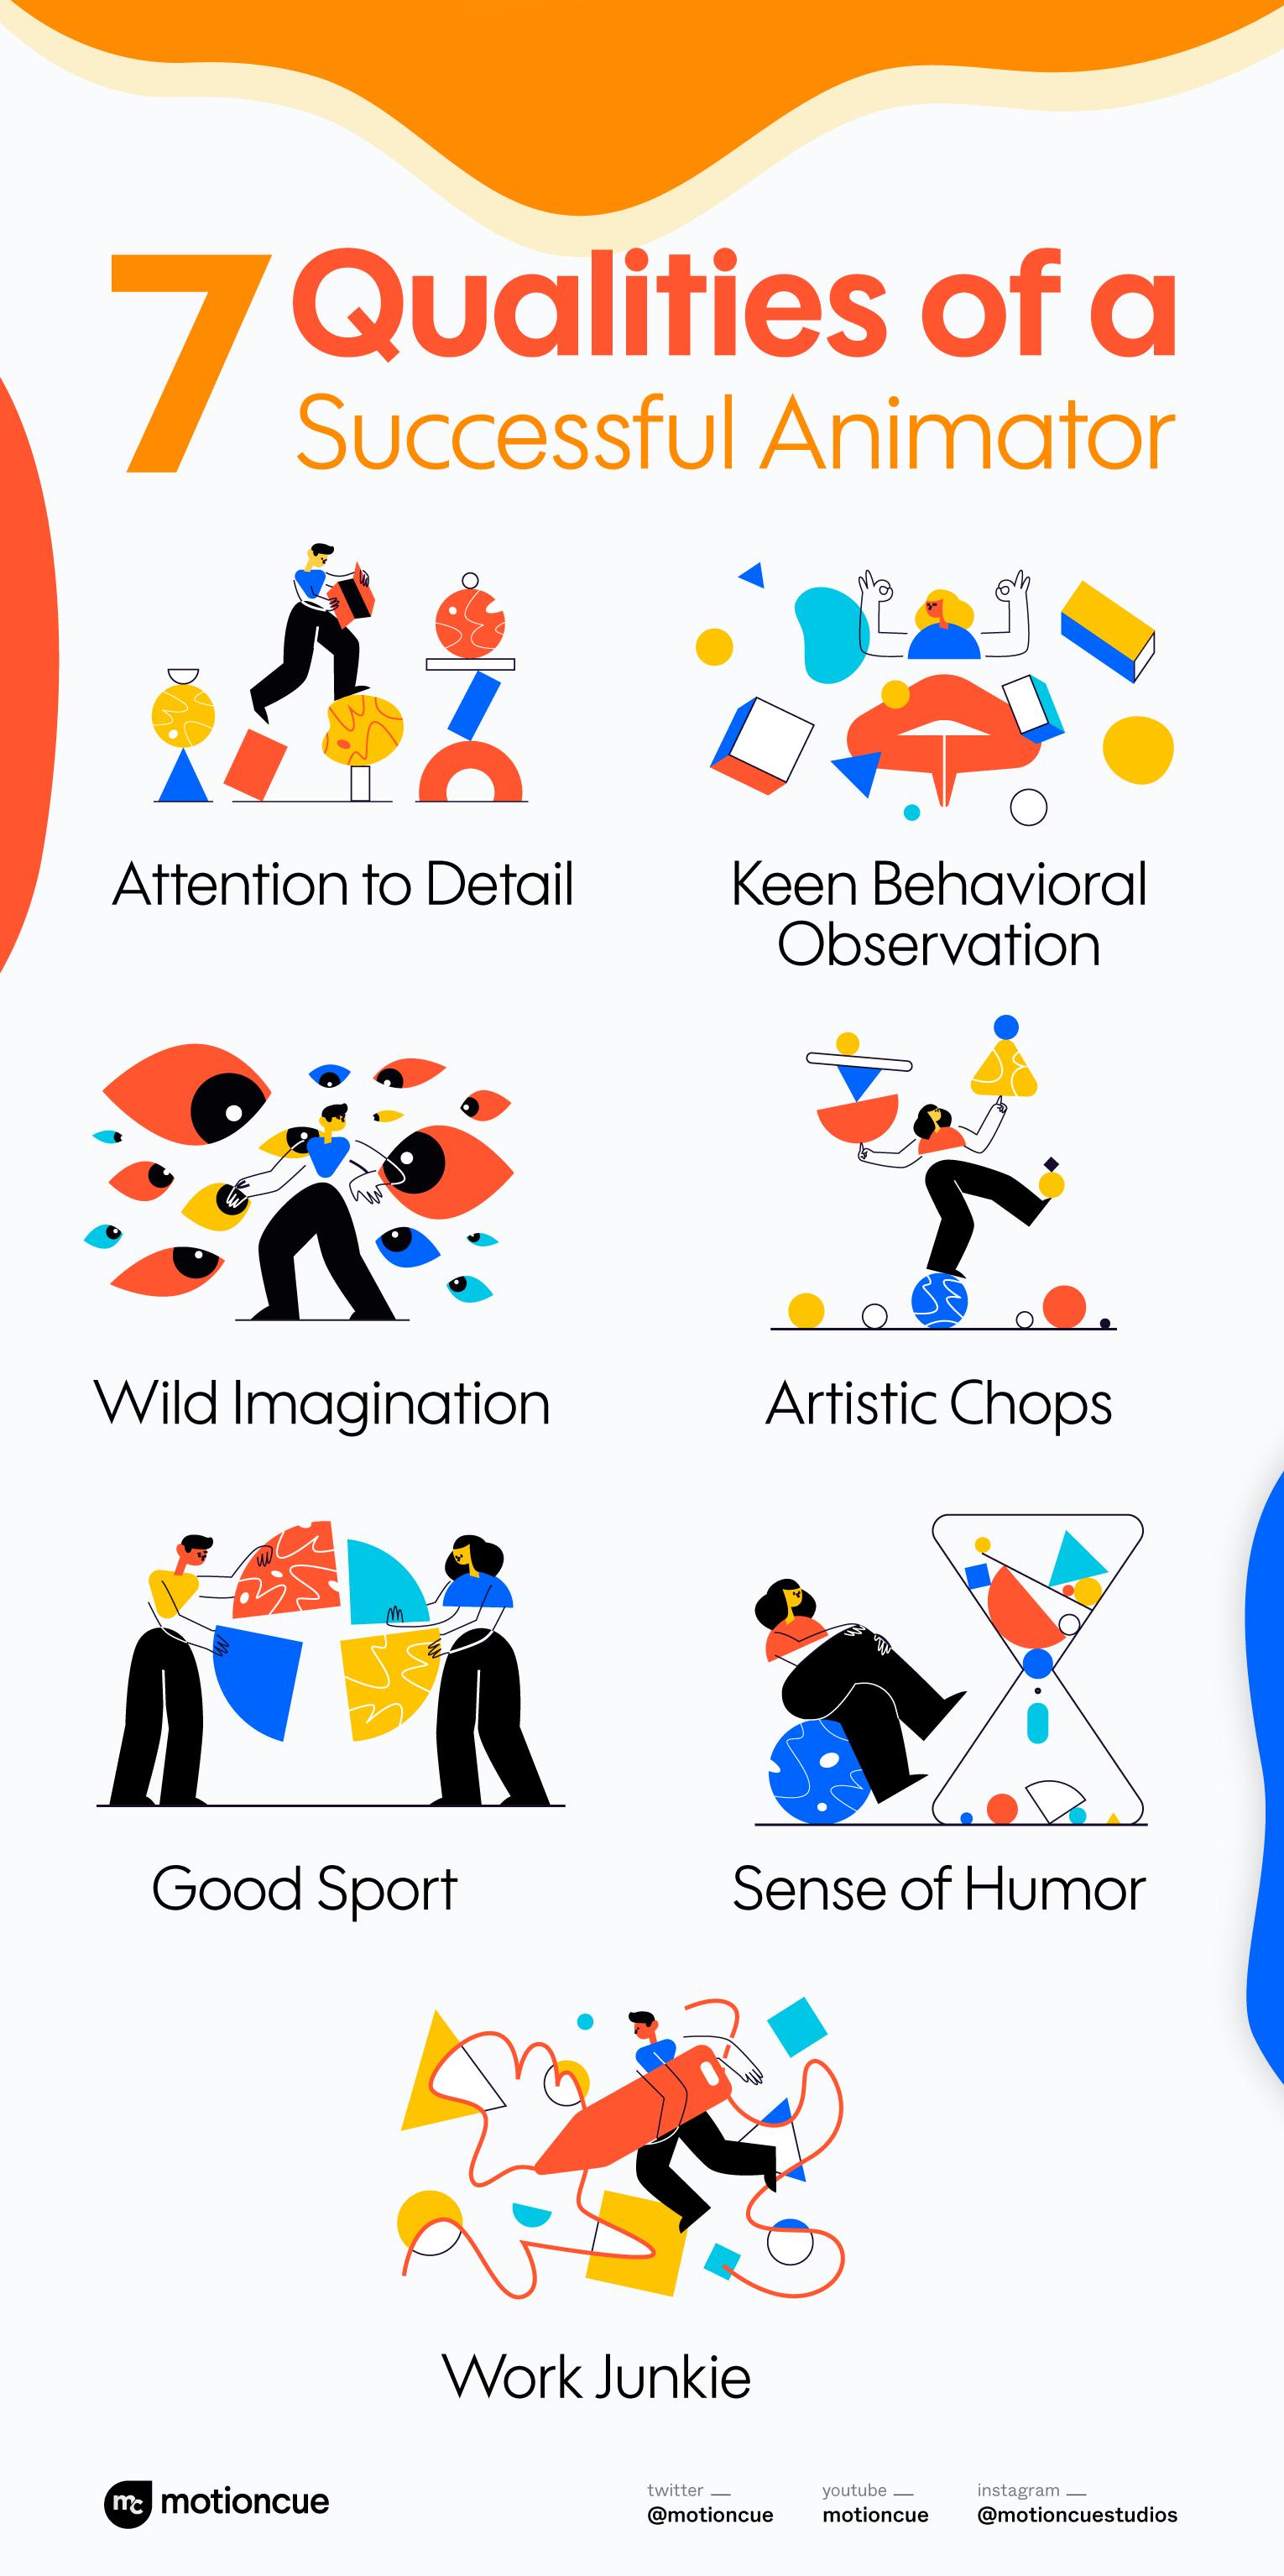 characteristics of an animator - MotionCue